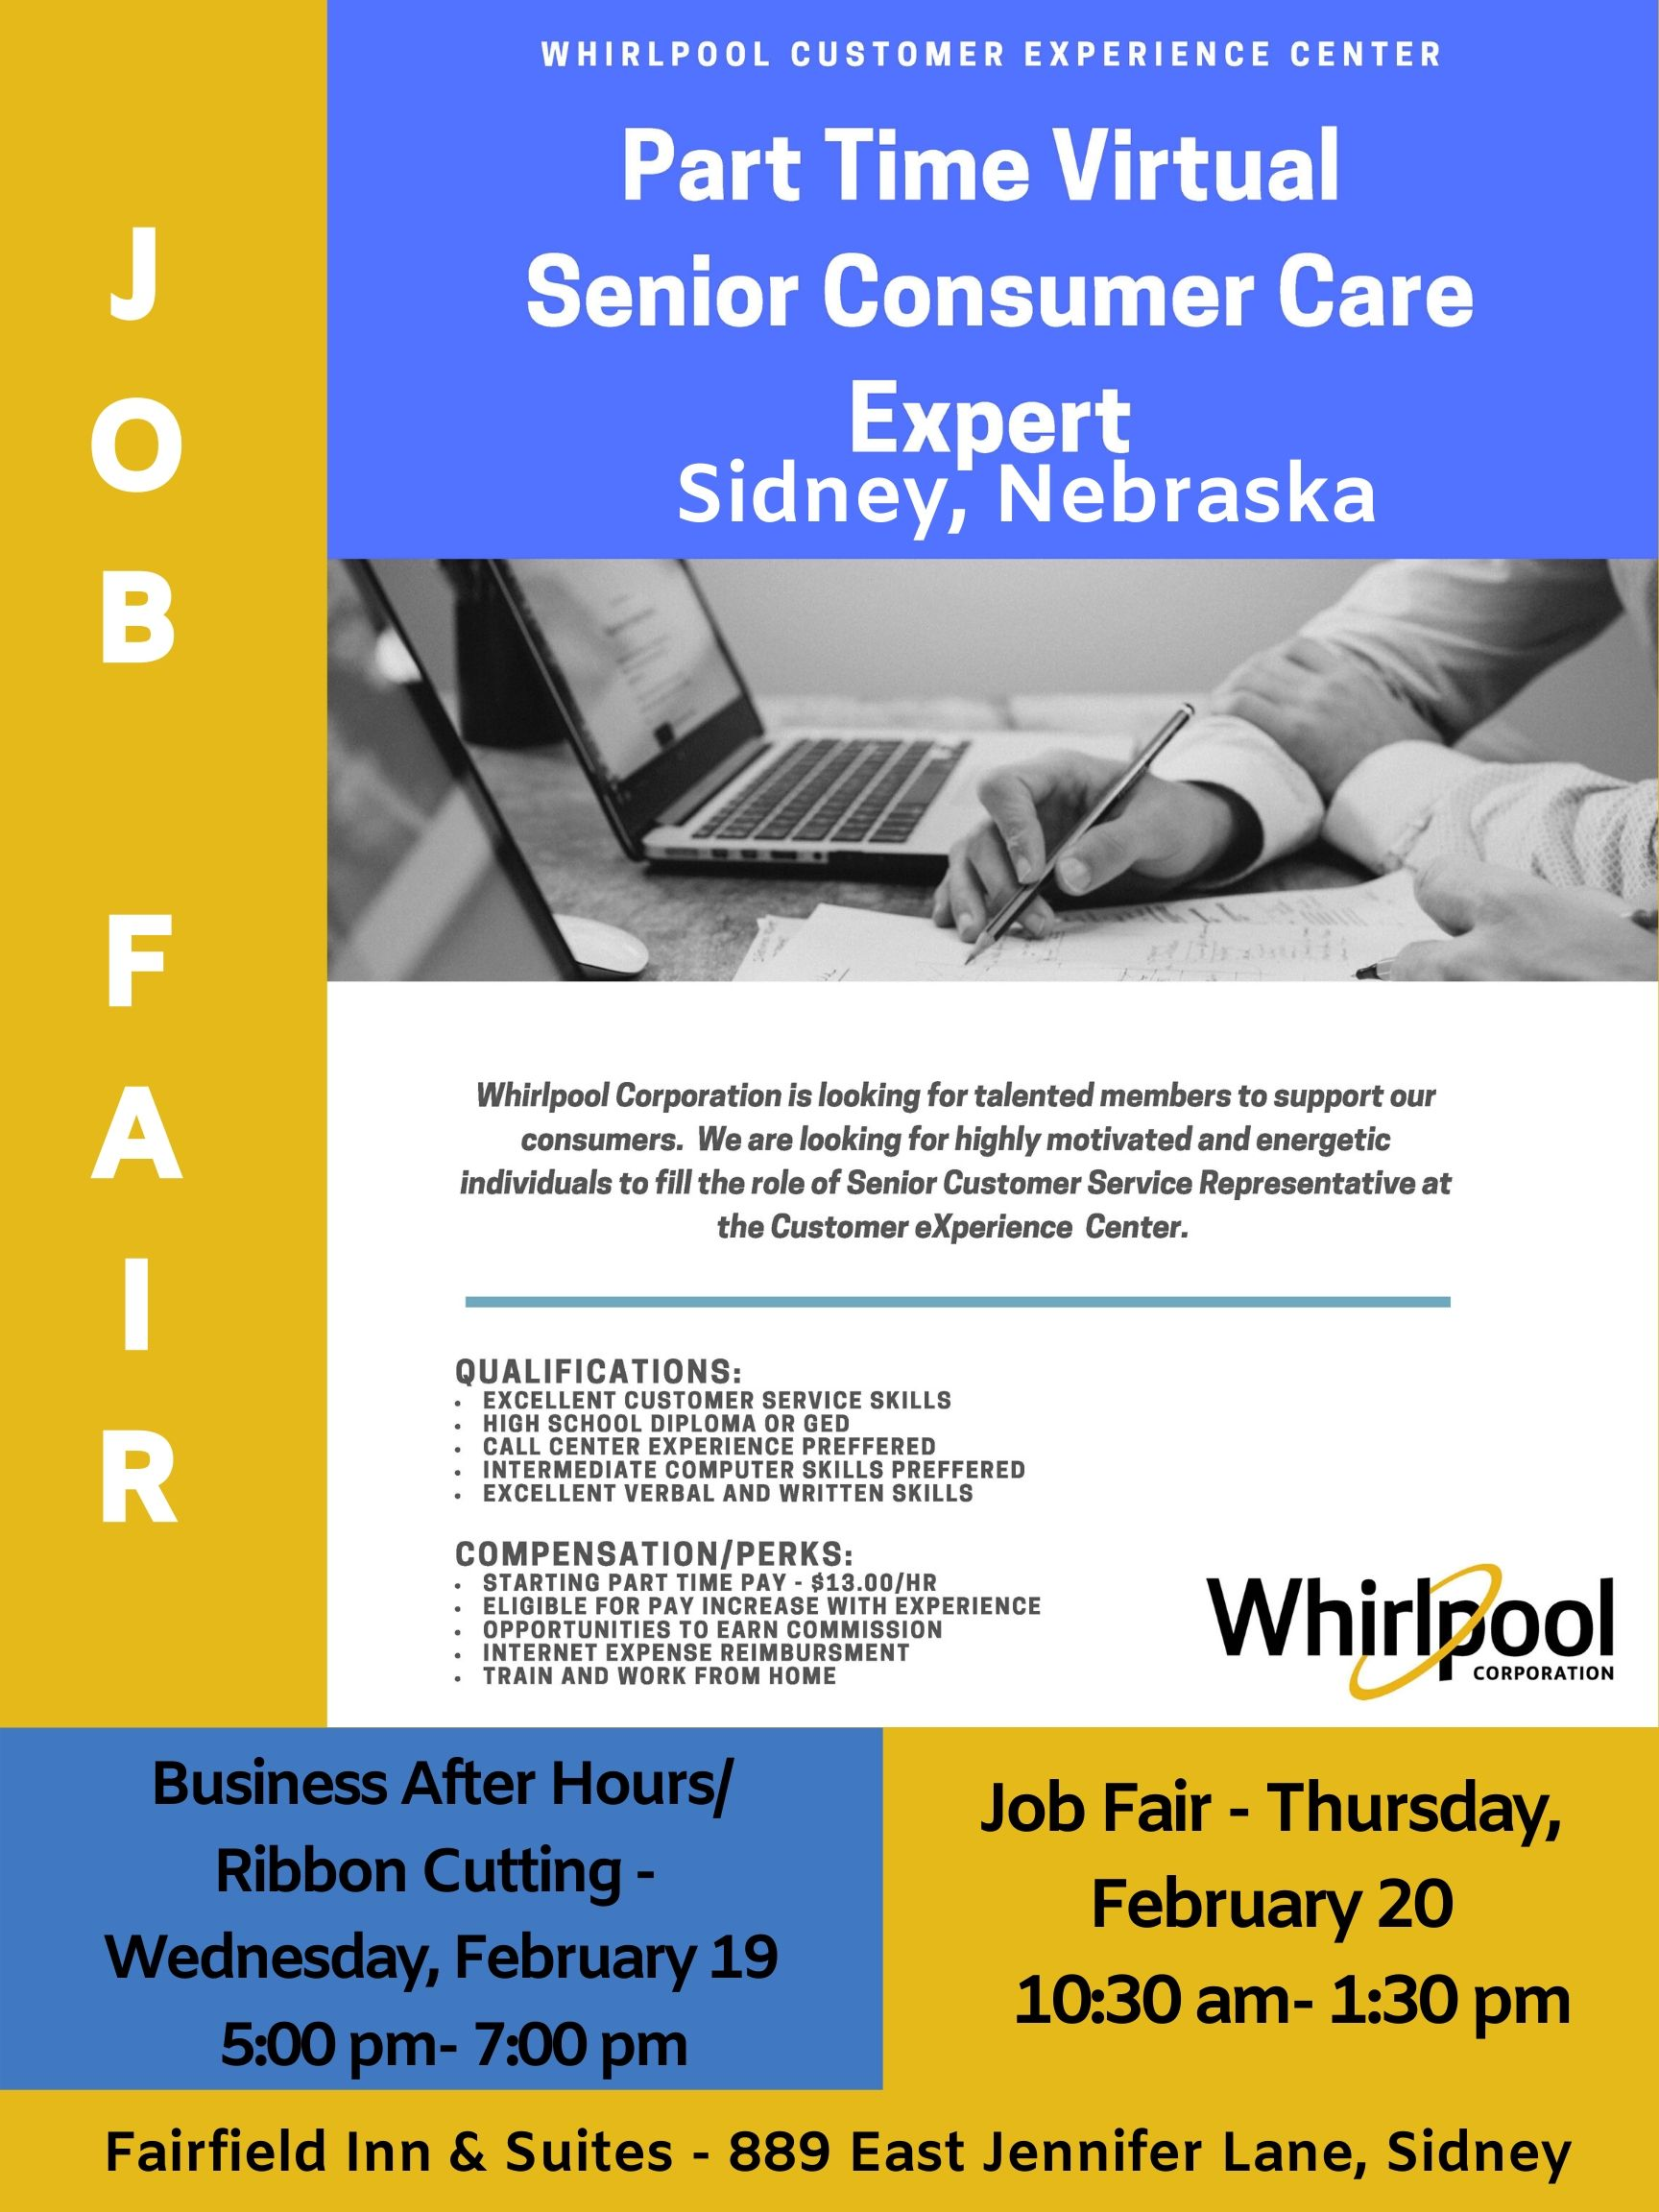 Whirlpool-Job-Fair-Poster-(1).jpg